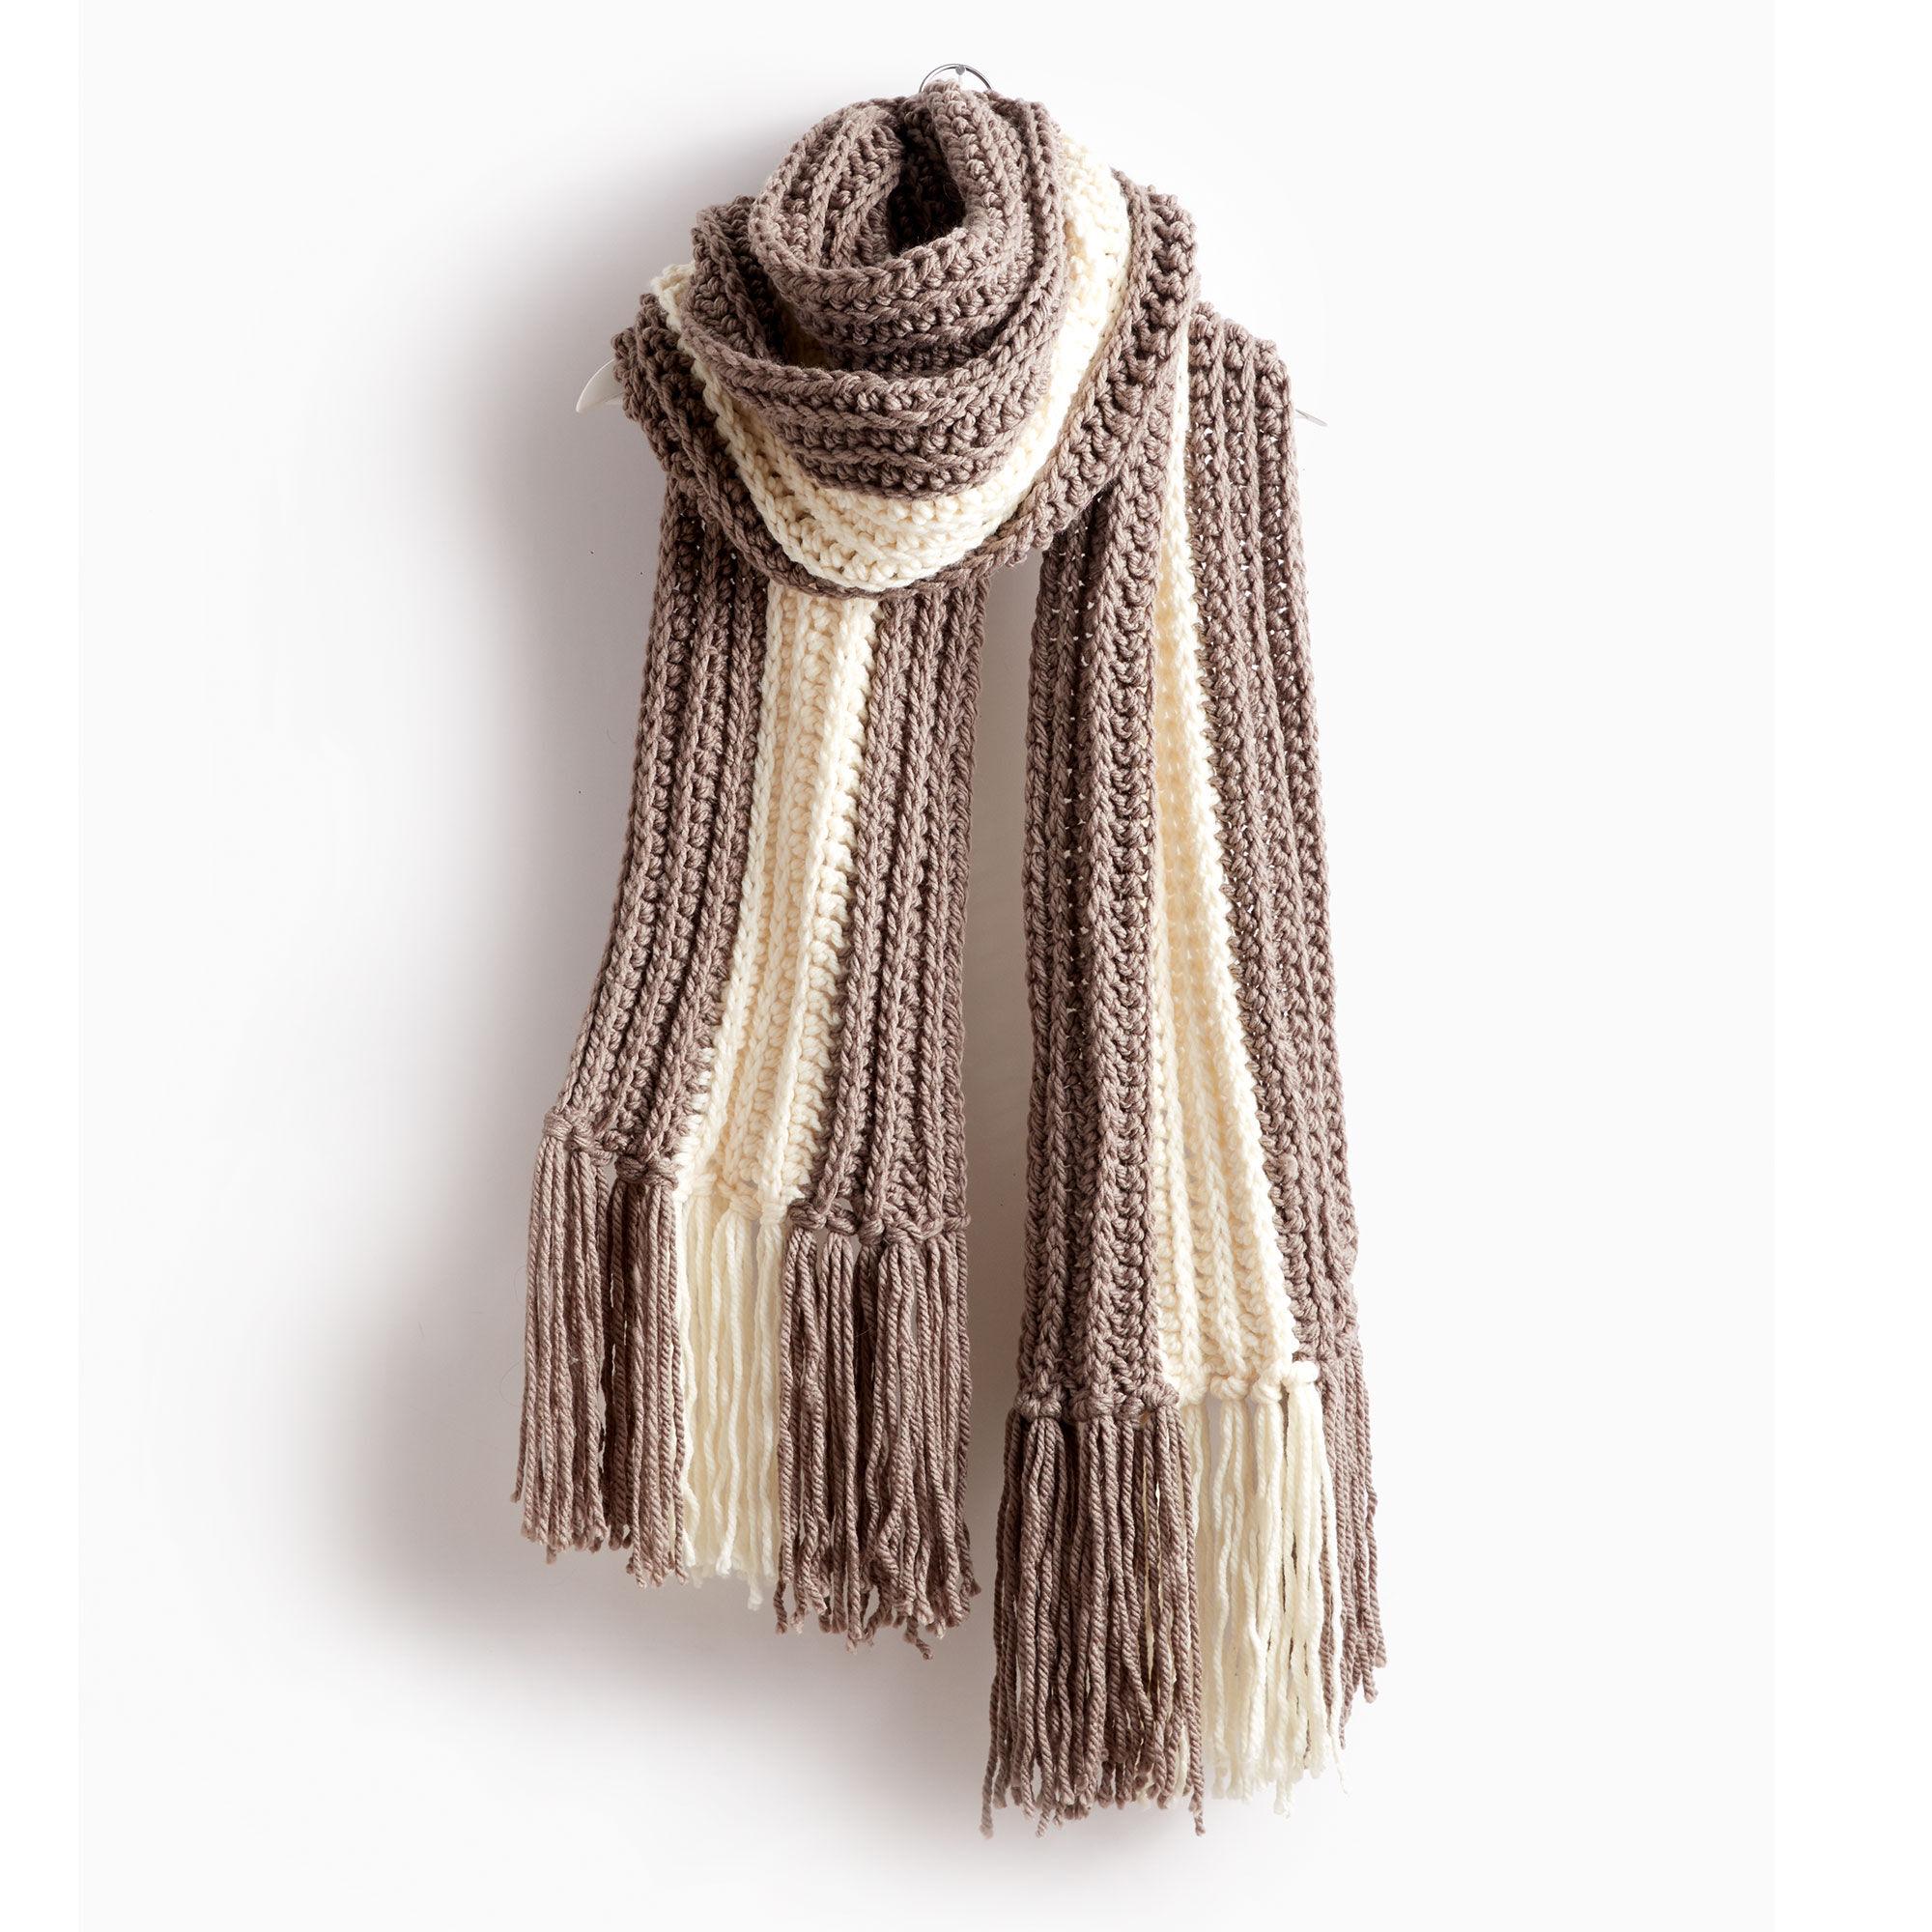 Bernat Highline Crochet Super Scarf, Taupe Gray/Natural   Yarnspirations